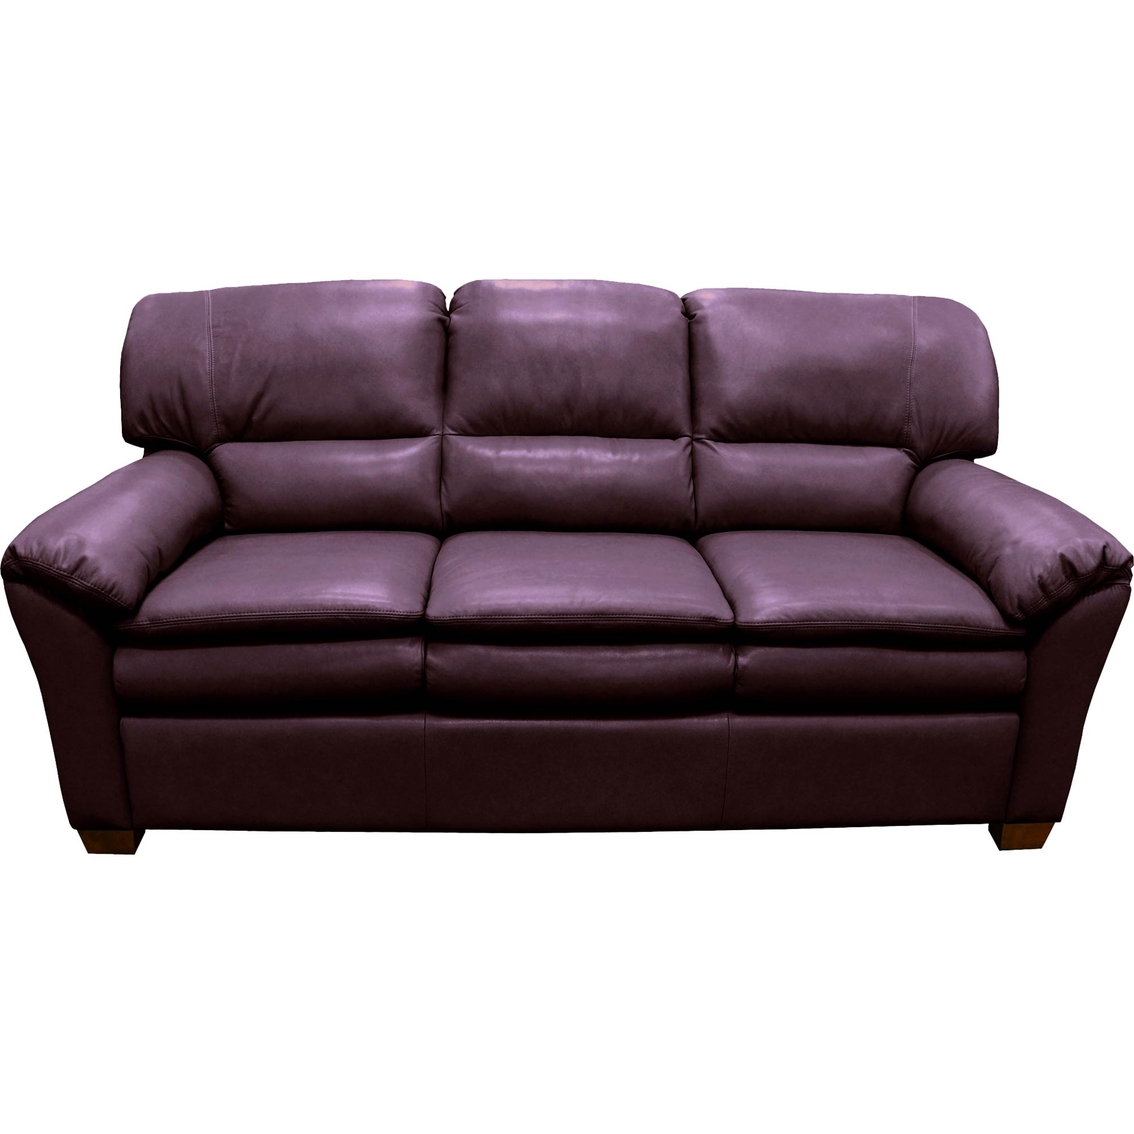 plum leather sofa set informa  thesofa